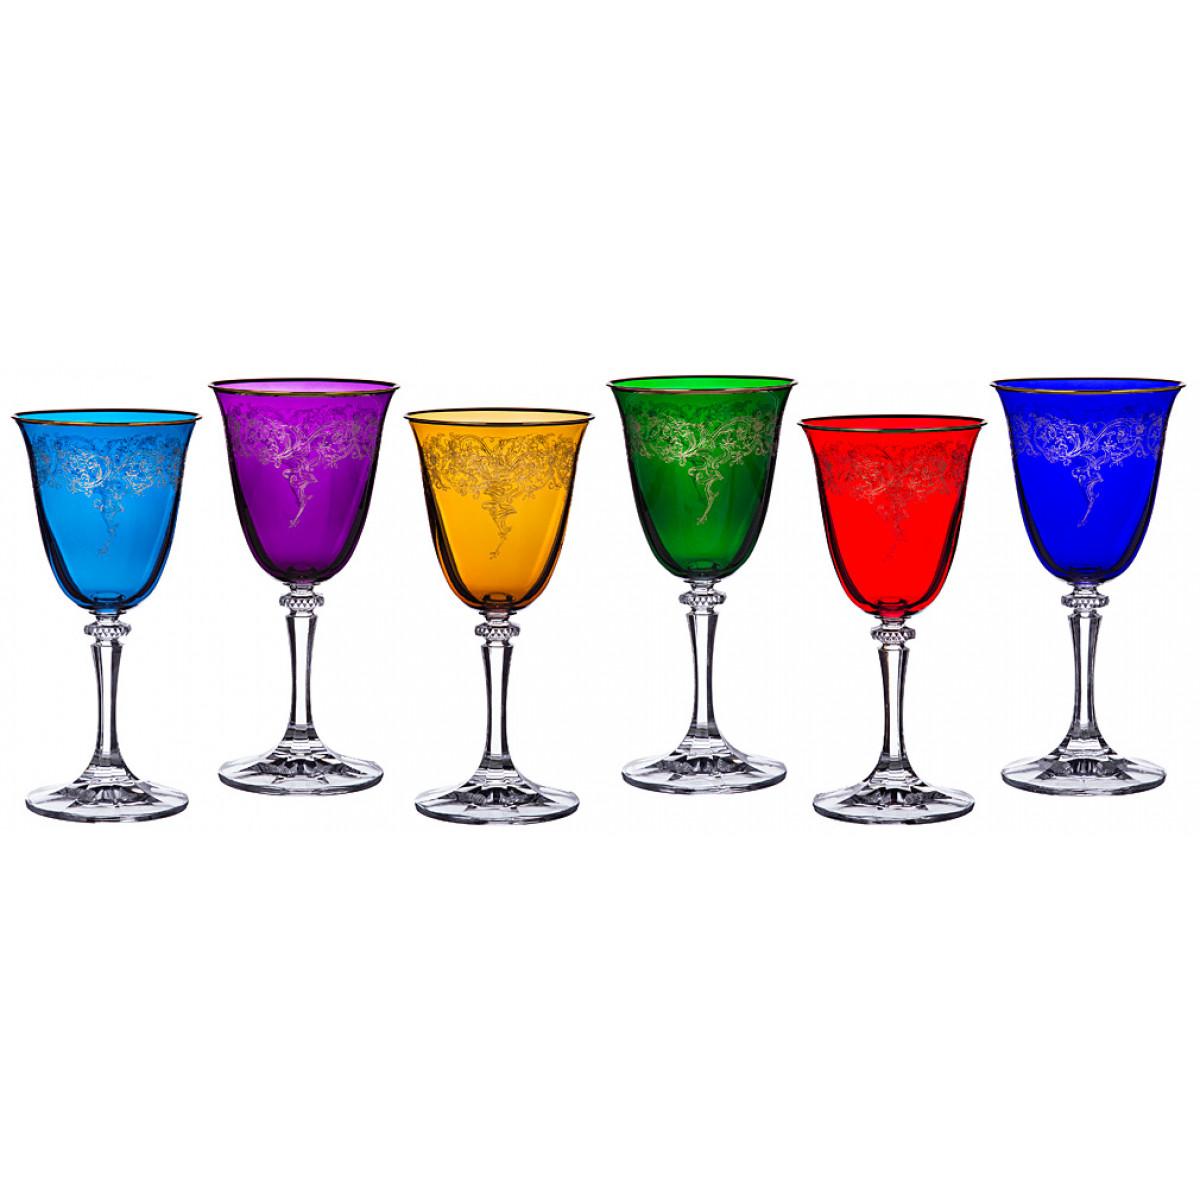 {} Crystalite Bohemia Набор бокалов для вина Uriella (18 см - 6 шт) набор бокалов для бренди 6 шт crystalite bohemia набор бокалов для бренди 6 шт